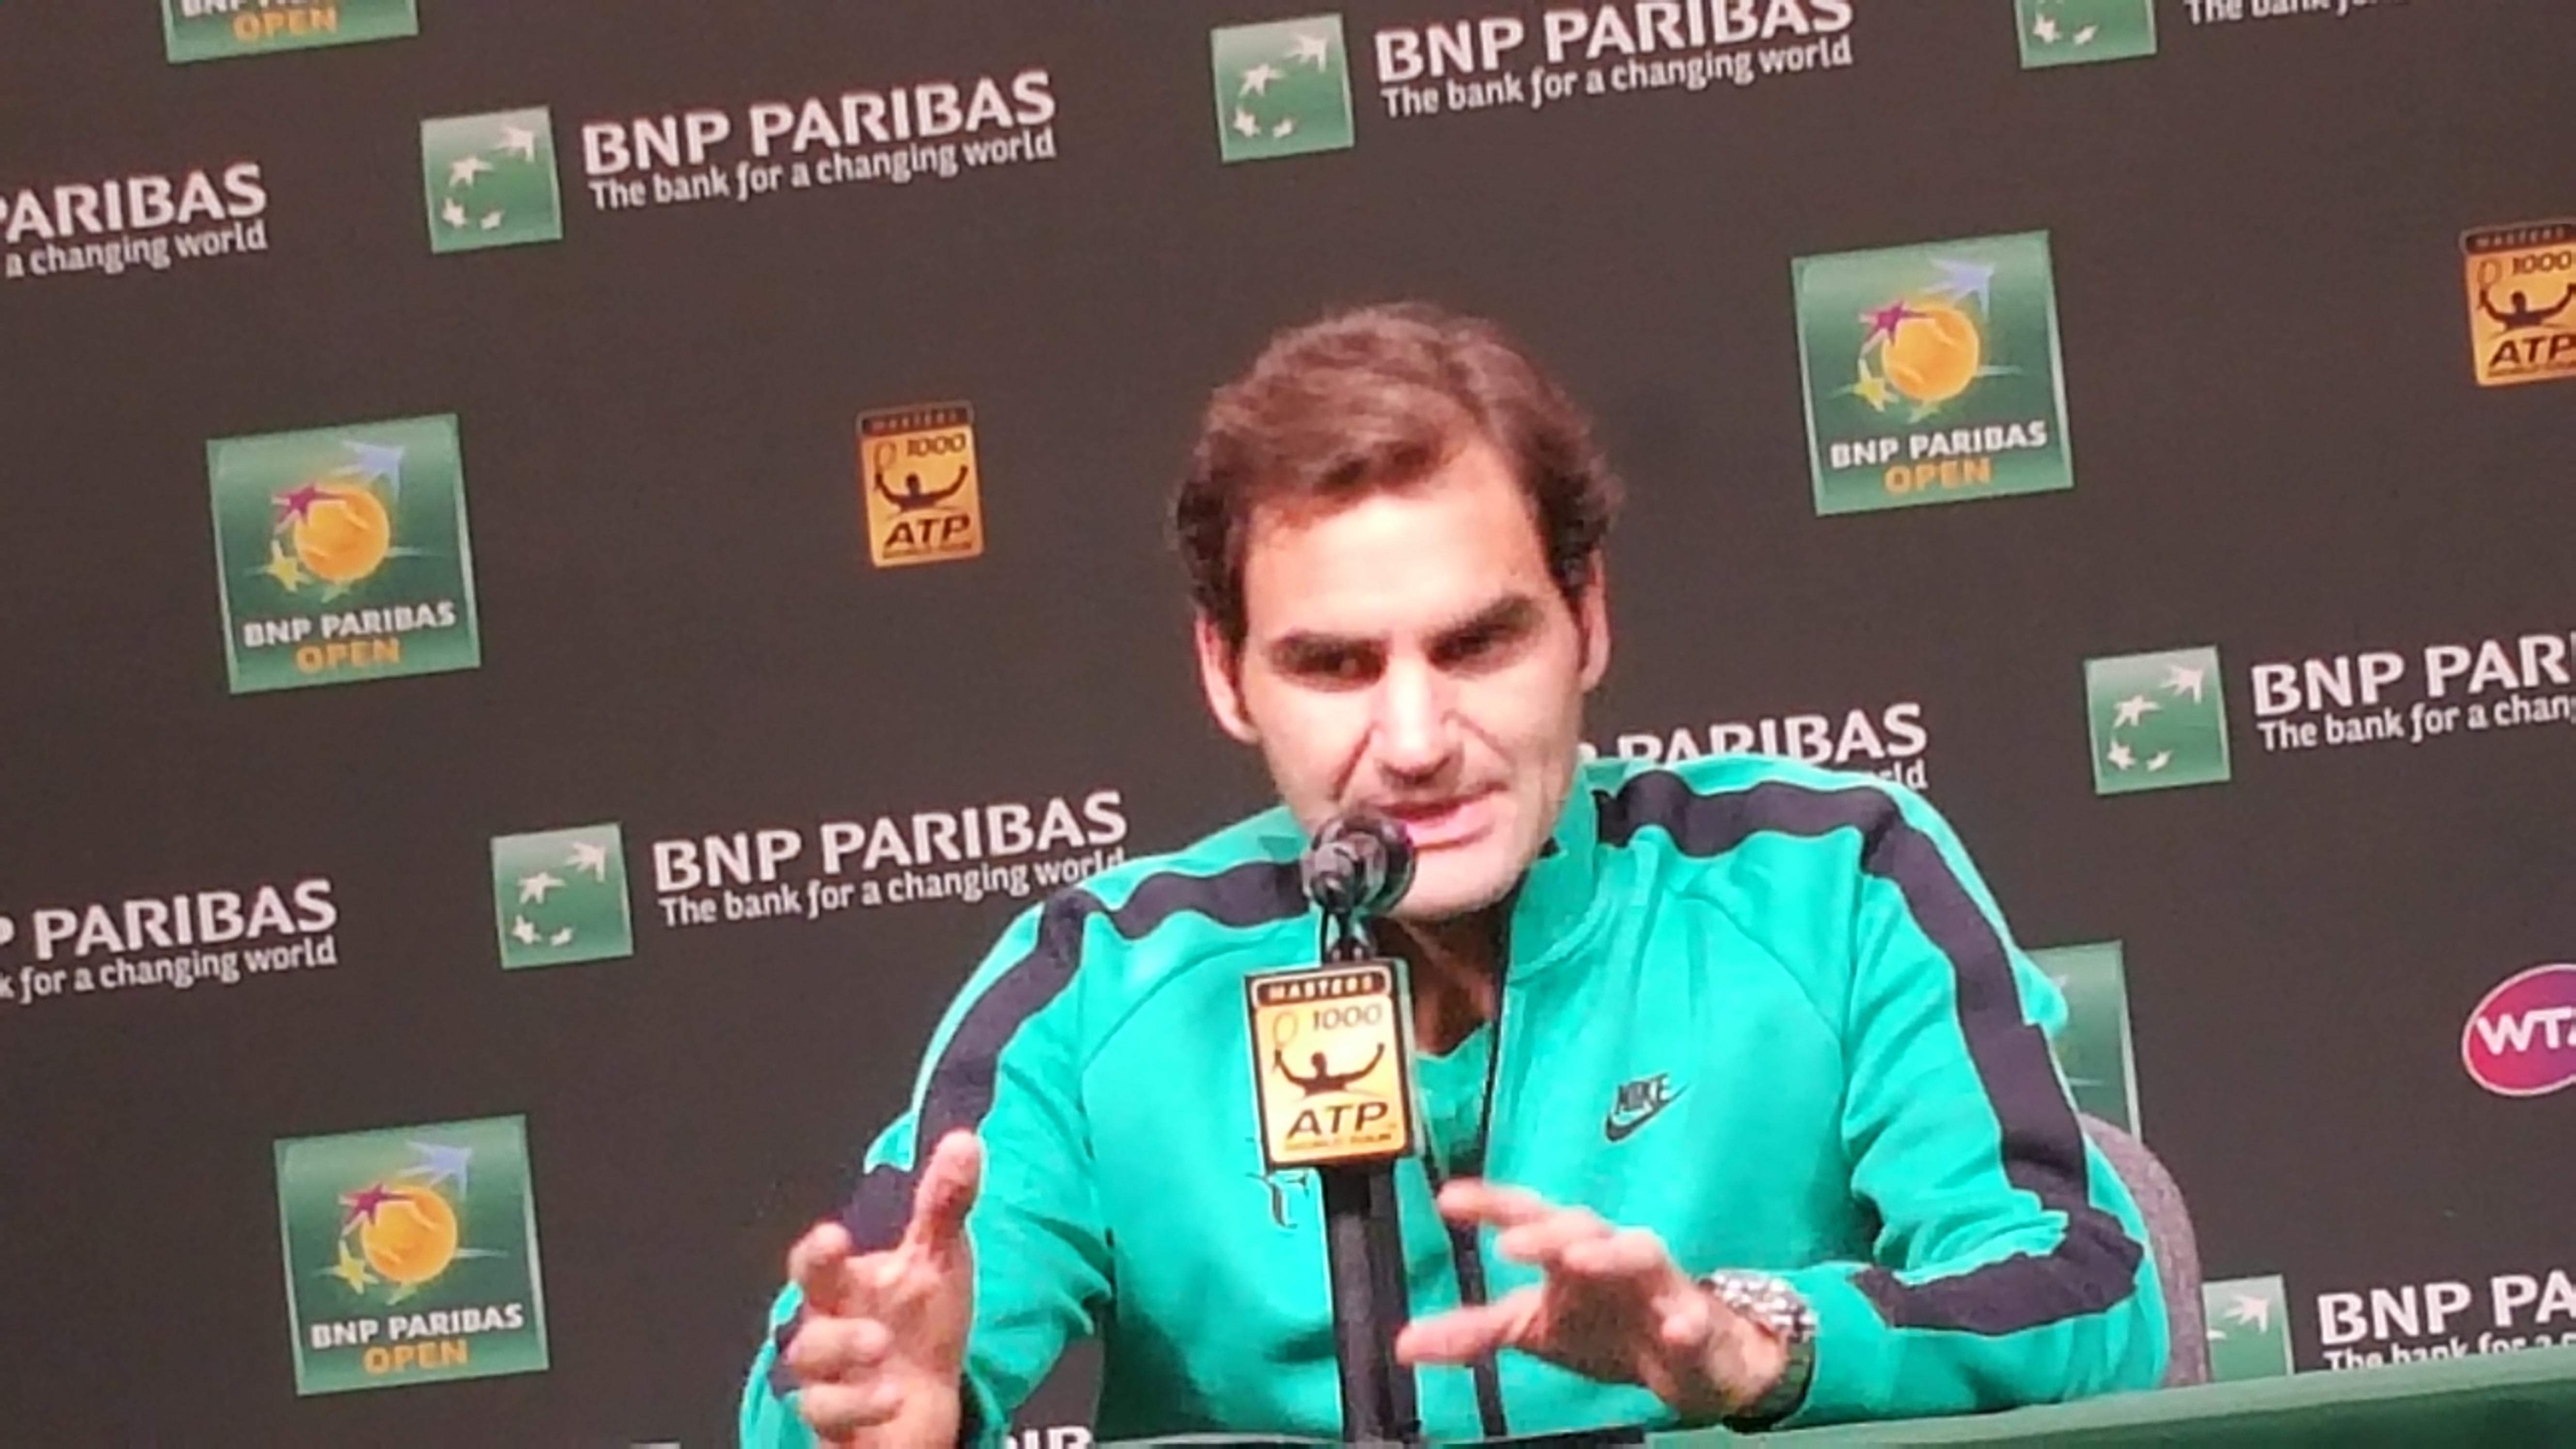 3-12-17 Roger Federer